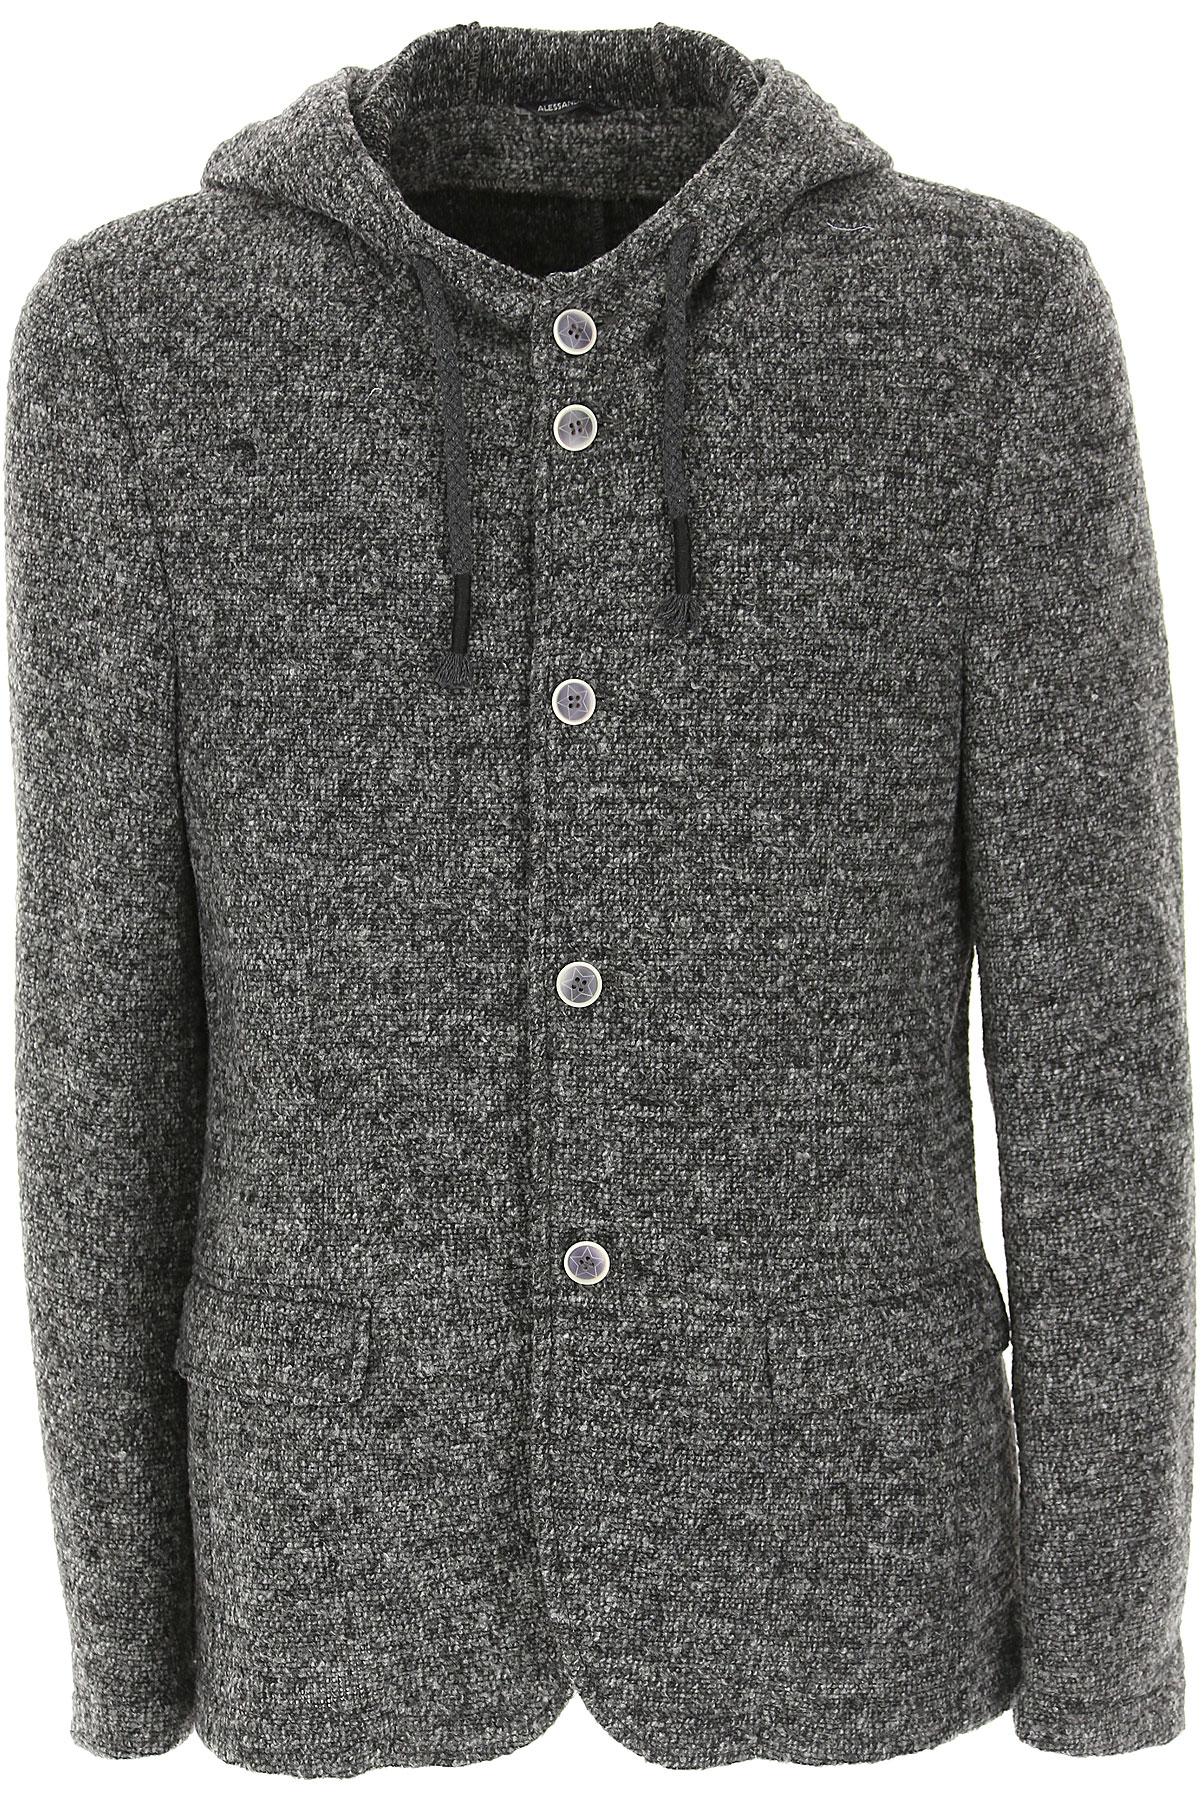 Image of Daniele Alessandrini Blazer for Men, Sport Coat, Grey Melange, polyester, 2017, L M S XL